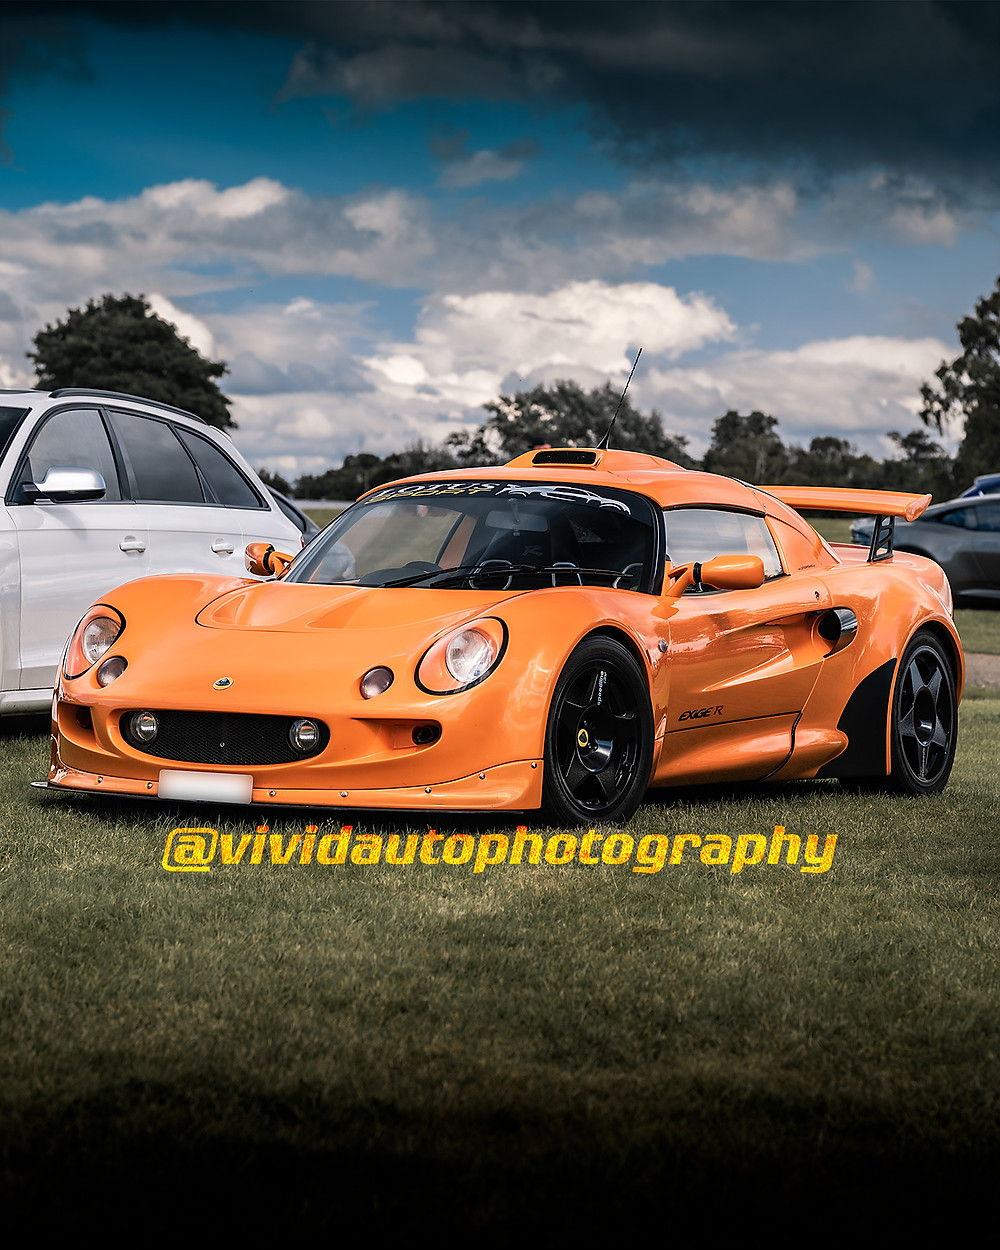 Lotus Exige R Chrome Orange   Front three quarters poster   Oulton Park